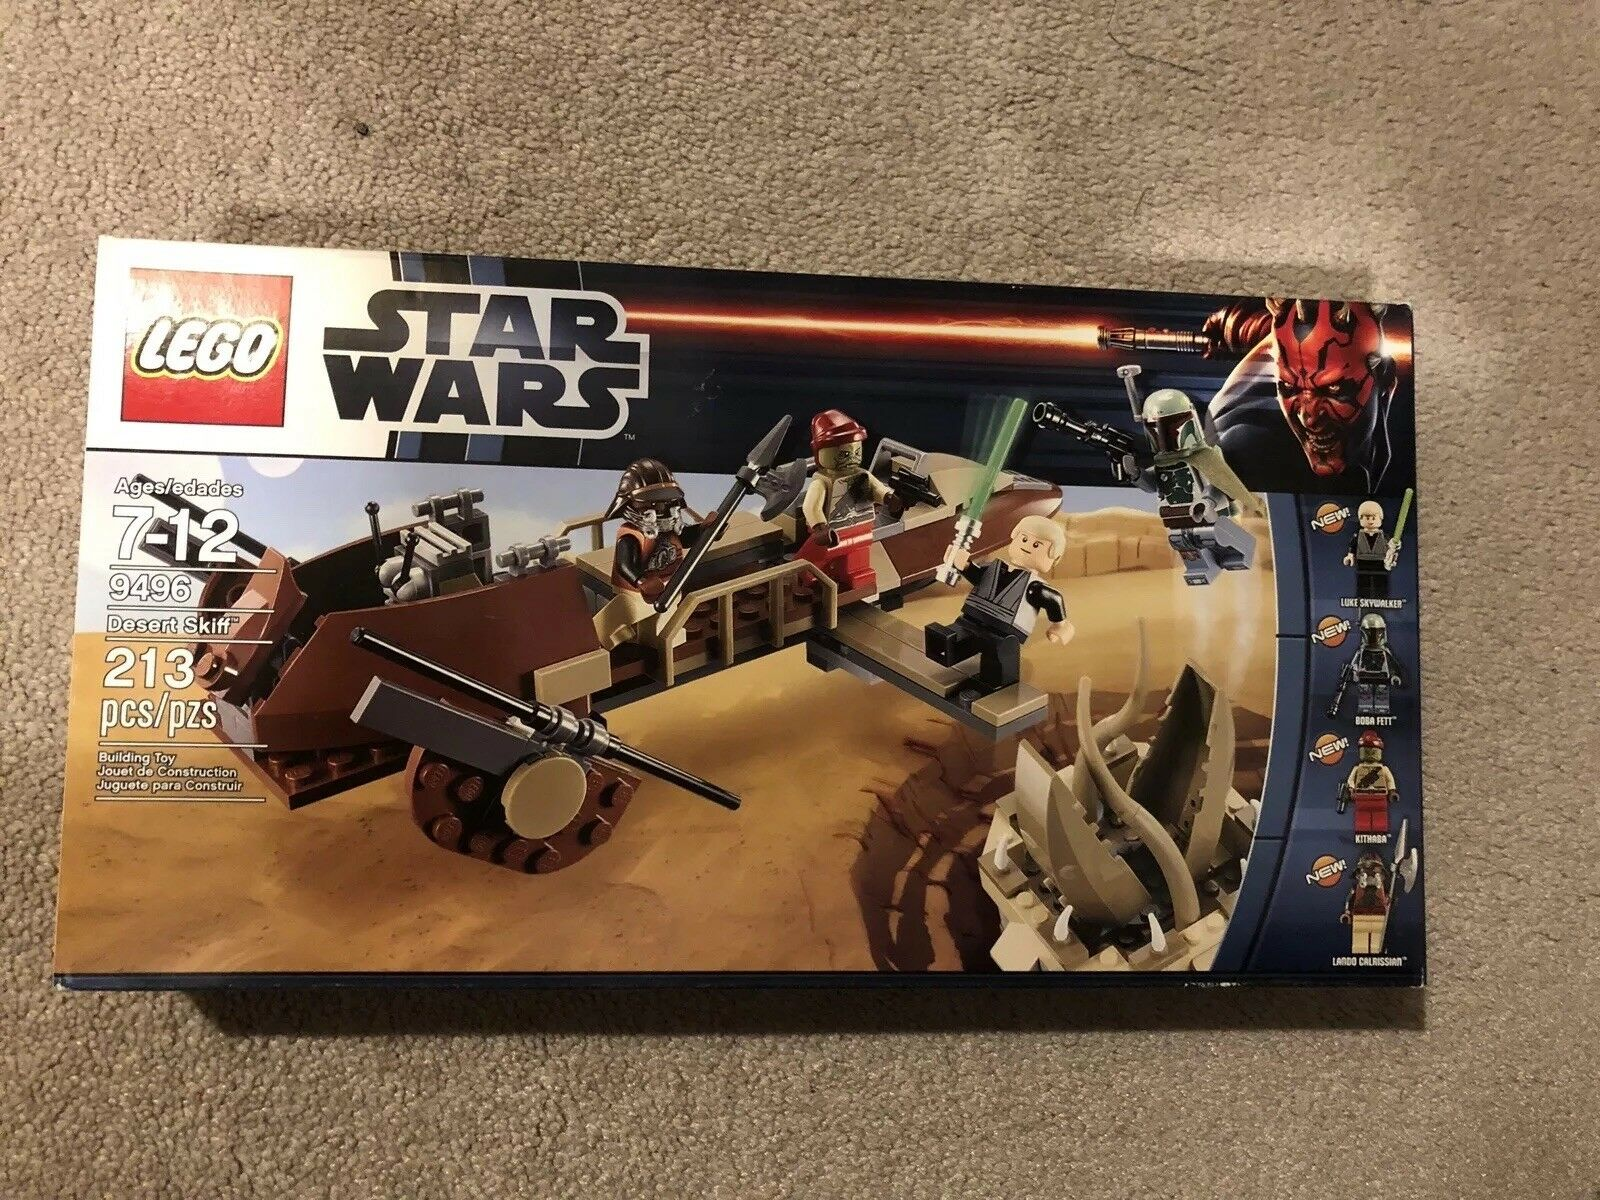 LEGO Star Wars desert skiff 9496 brand new and factory sealed Retired